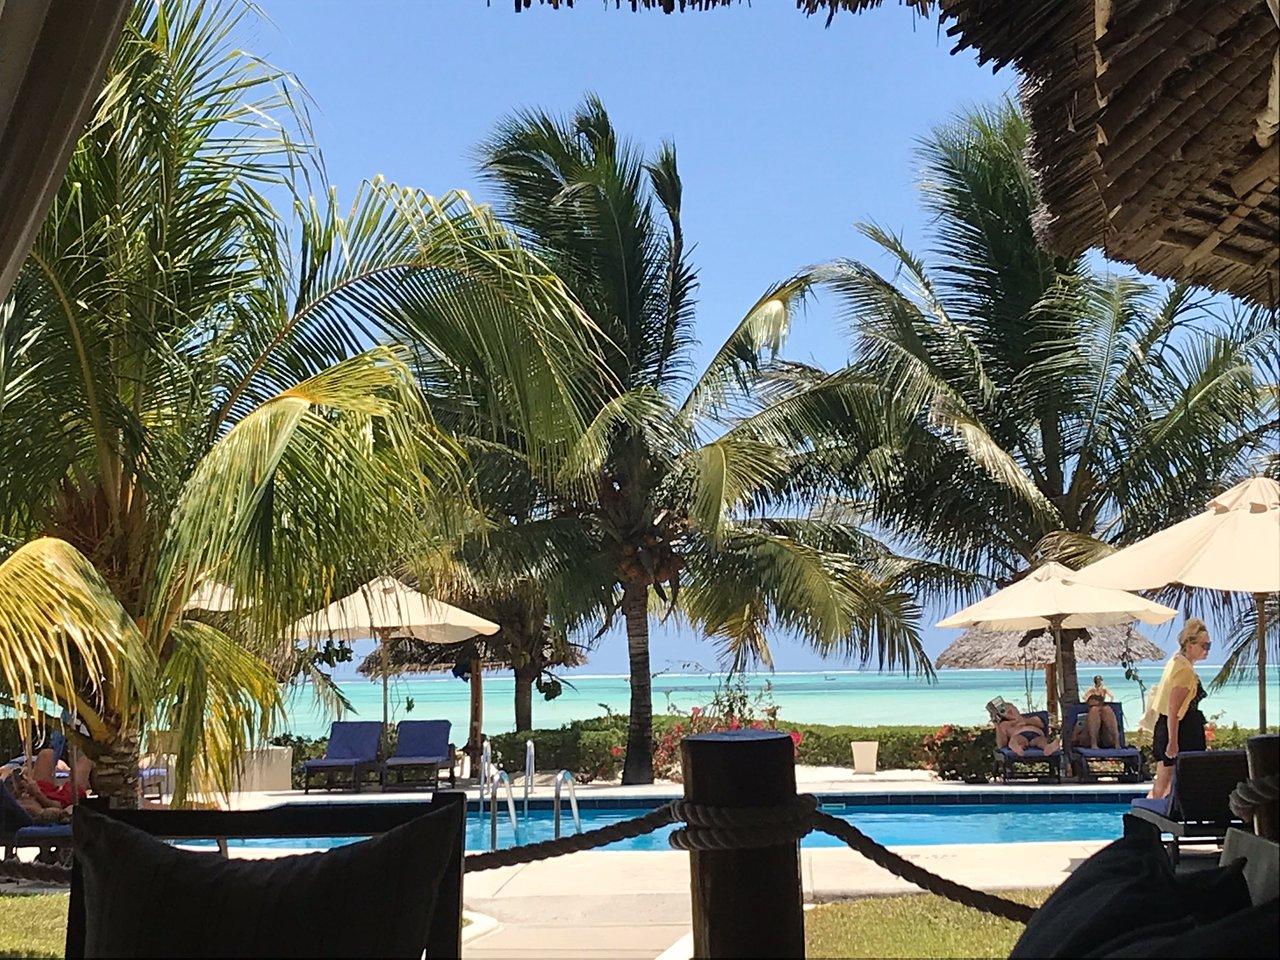 Kisiwa On The Beach Resort Updated 2018 Prices Hotel Reviews Zanzibar Island Paje Tripadvisor